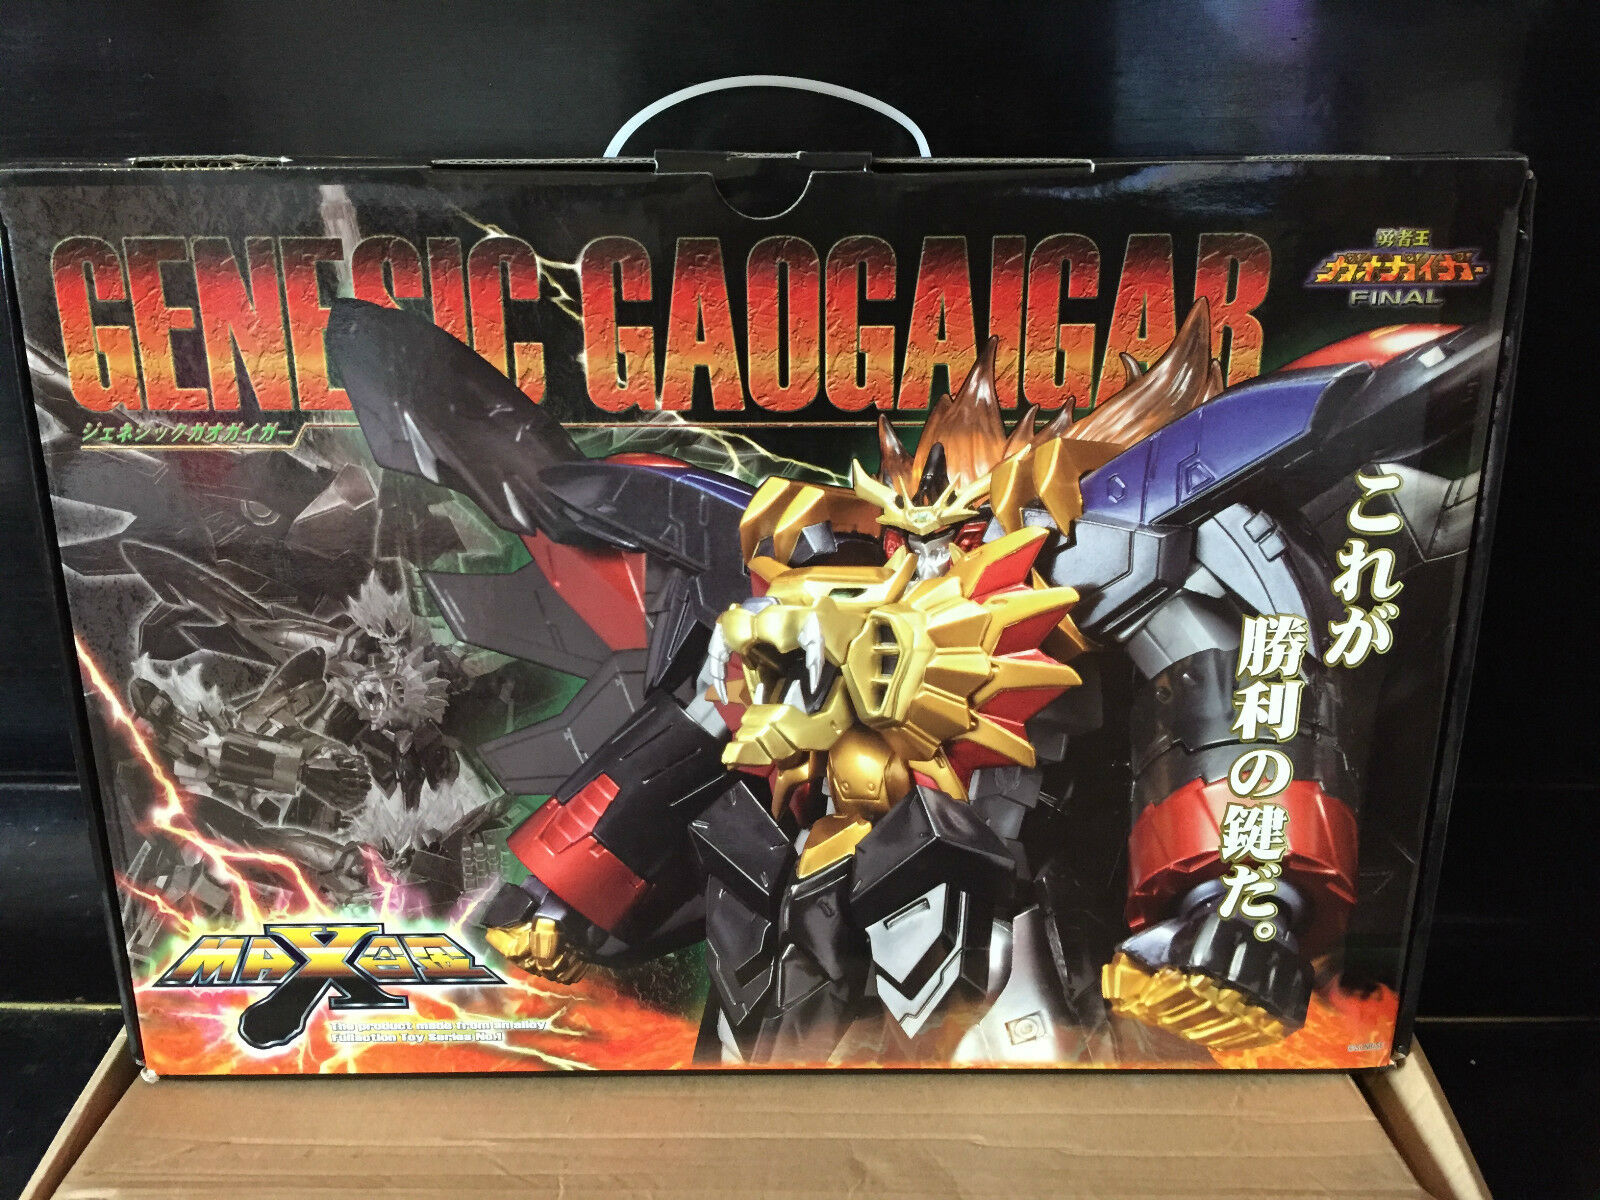 GENESIC GAOGAIGAR GAOGAIGAR GAOGAIGAR MAX KOTOBUKUYA FIRST EDITION CHECK THE BILDER INSIDE d49eb4